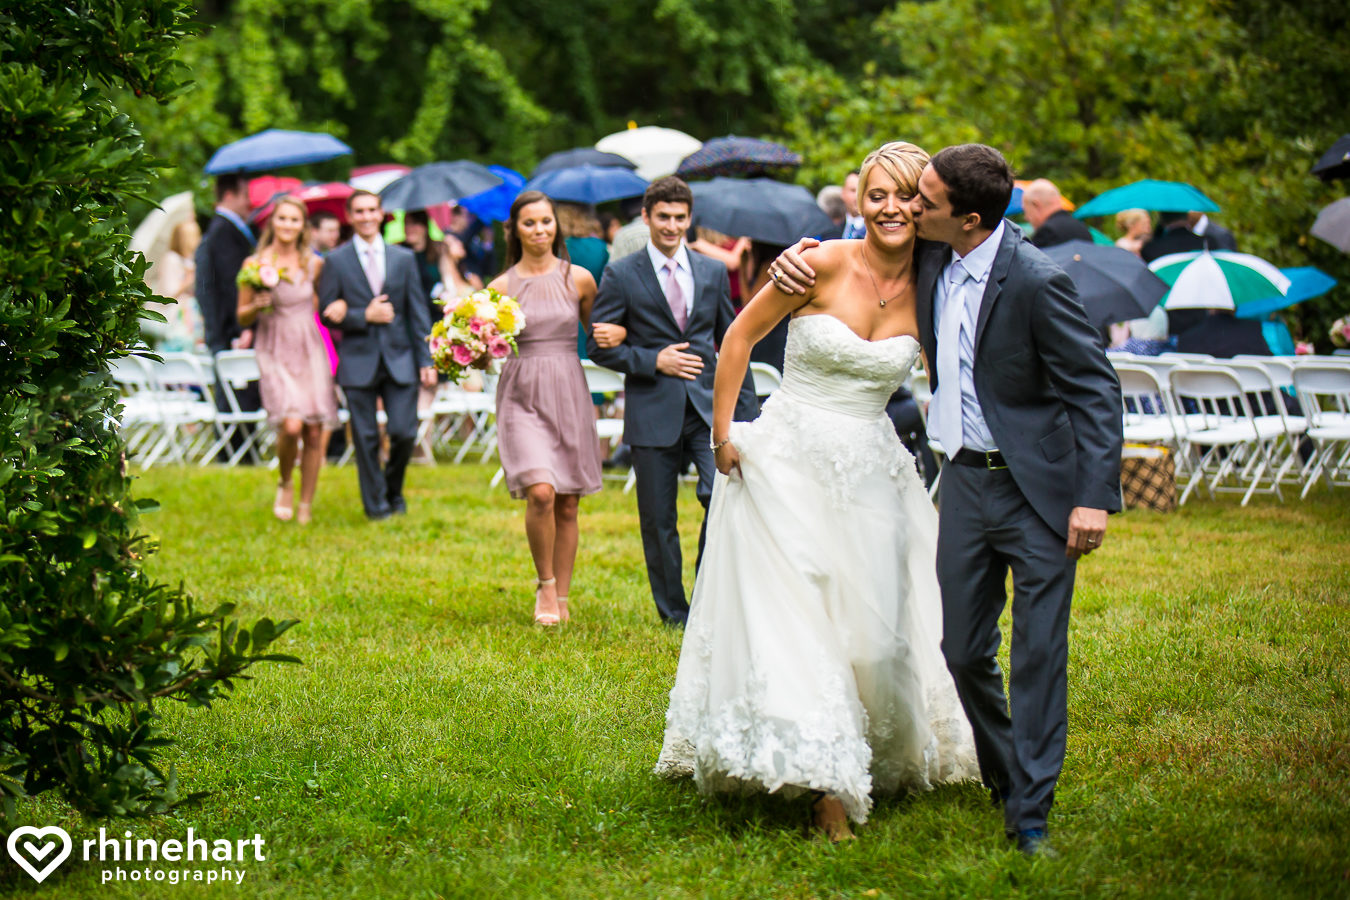 creative-unique-artistic-best-top-colorful-vibrant-emotional-pa-wedding-photographers-35